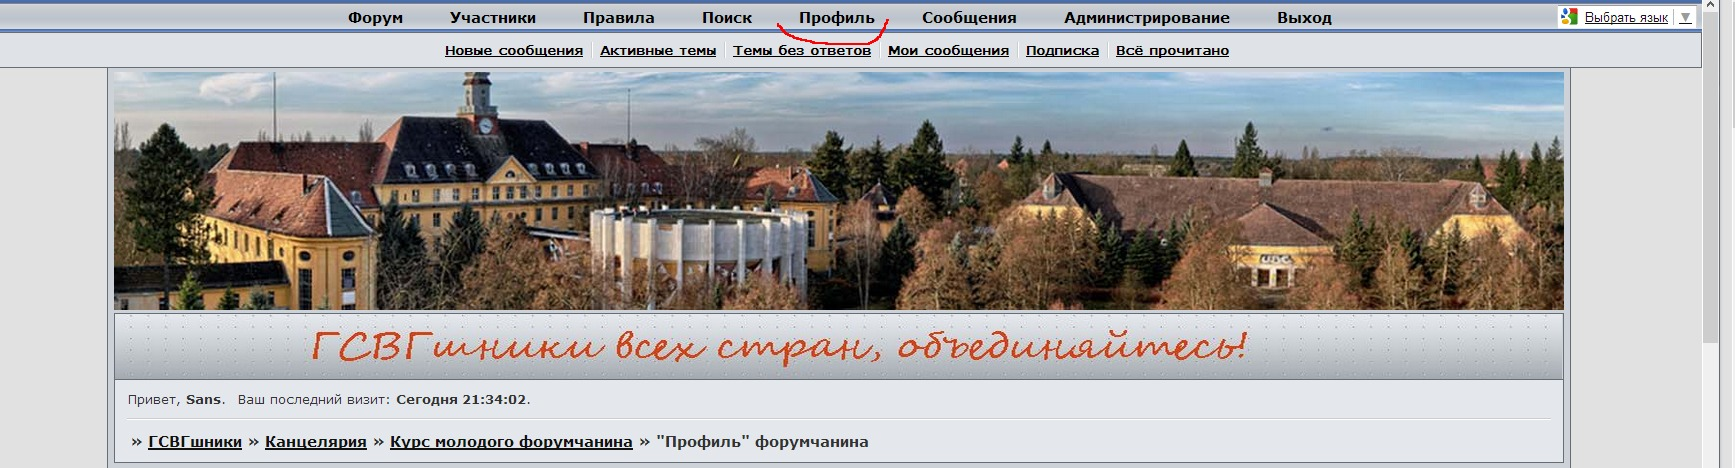 http://s2.uploads.ru/9y2uj.jpg